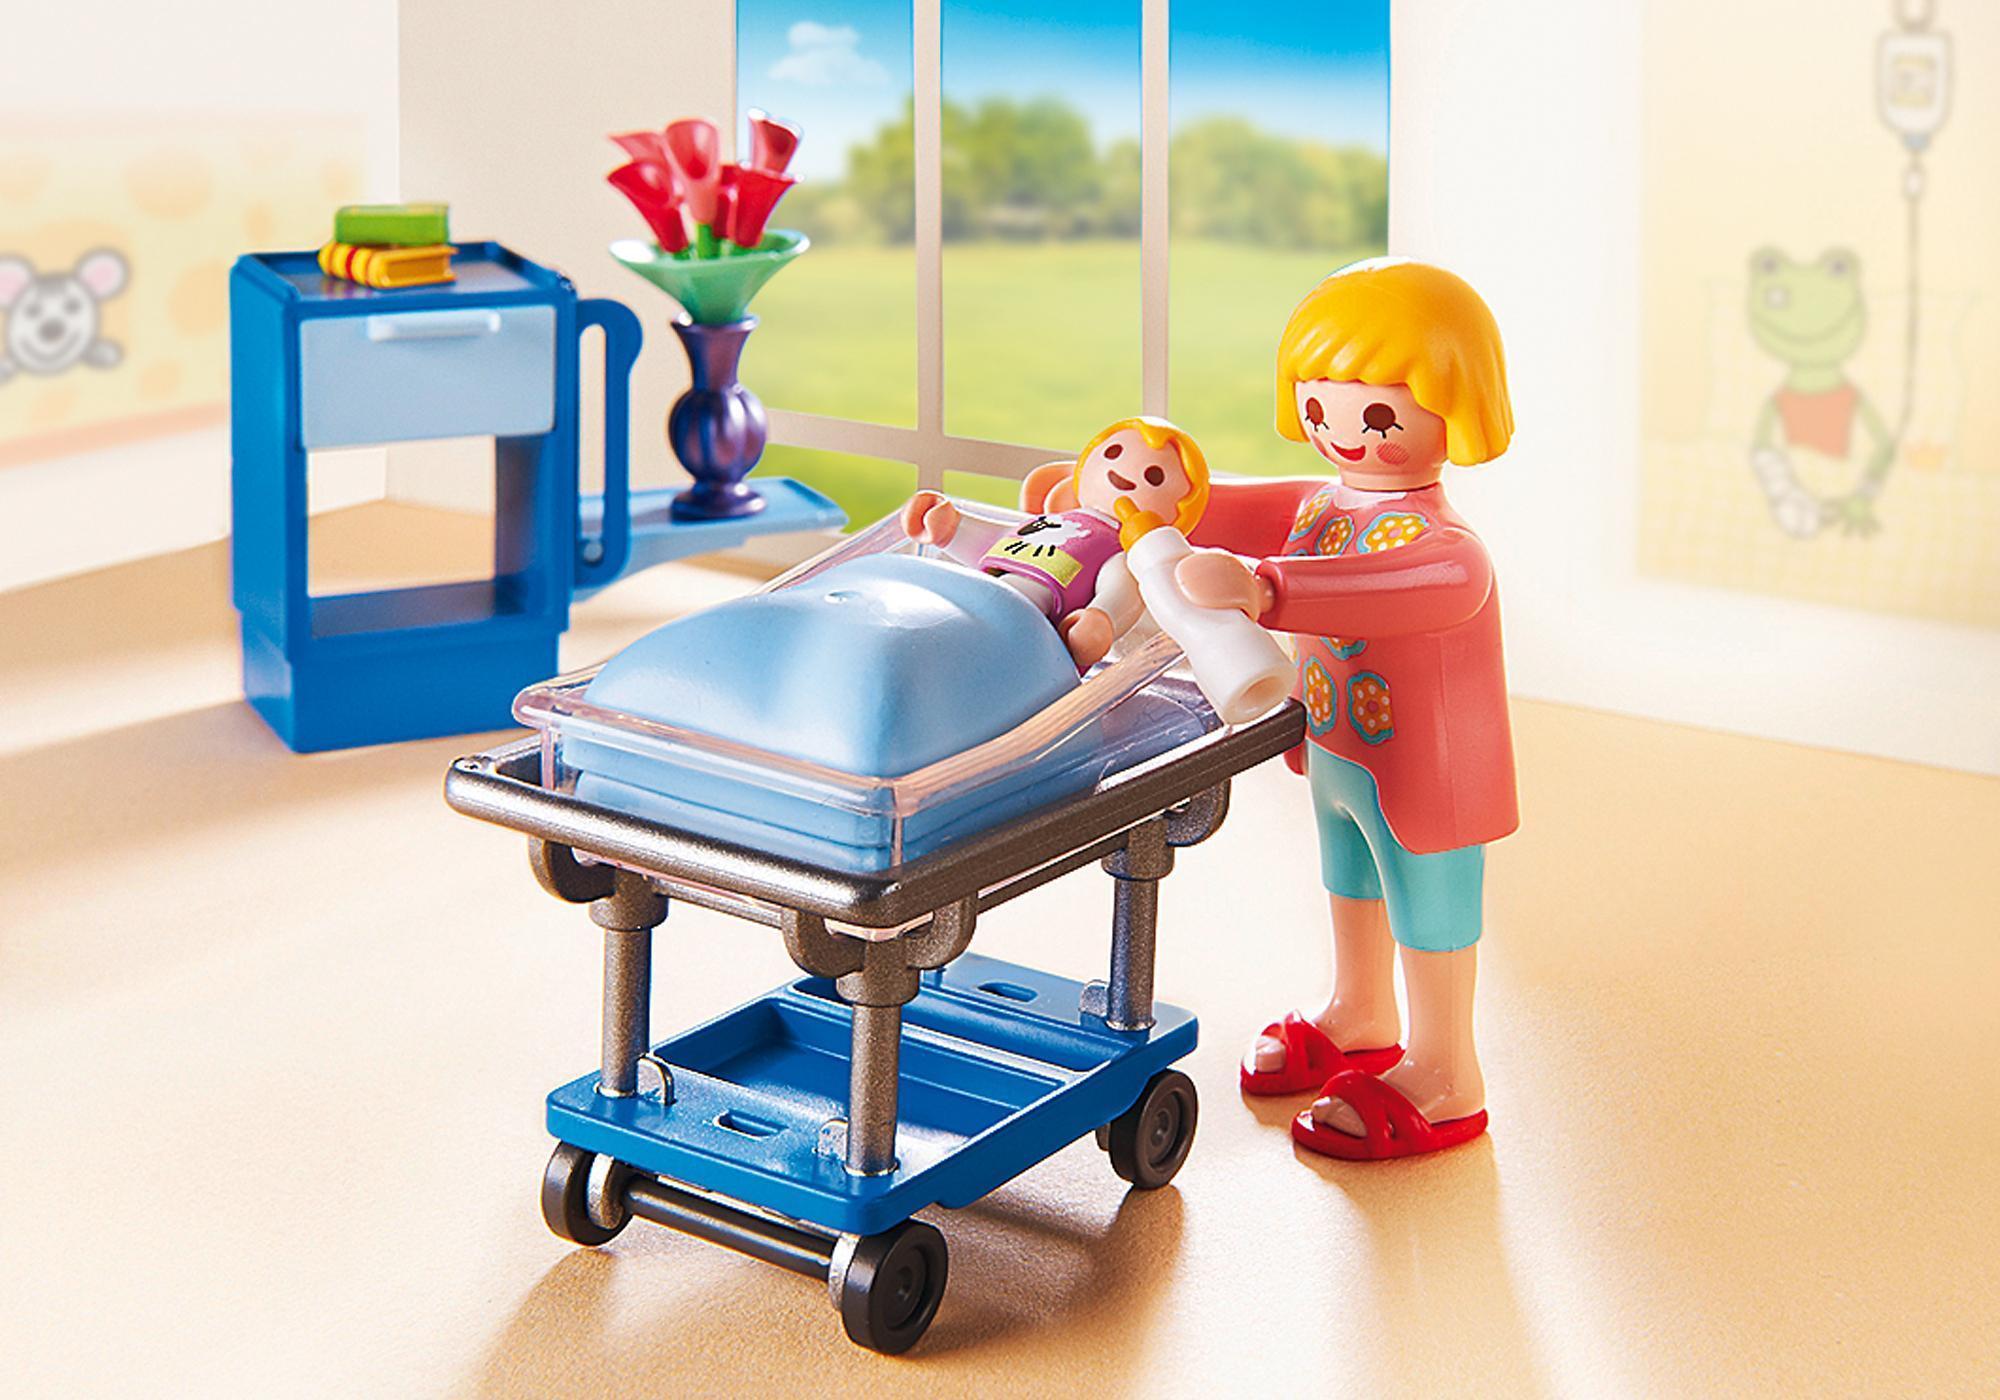 http://media.playmobil.com/i/playmobil/6660_product_extra1/Krankenzimmer mit Babybett